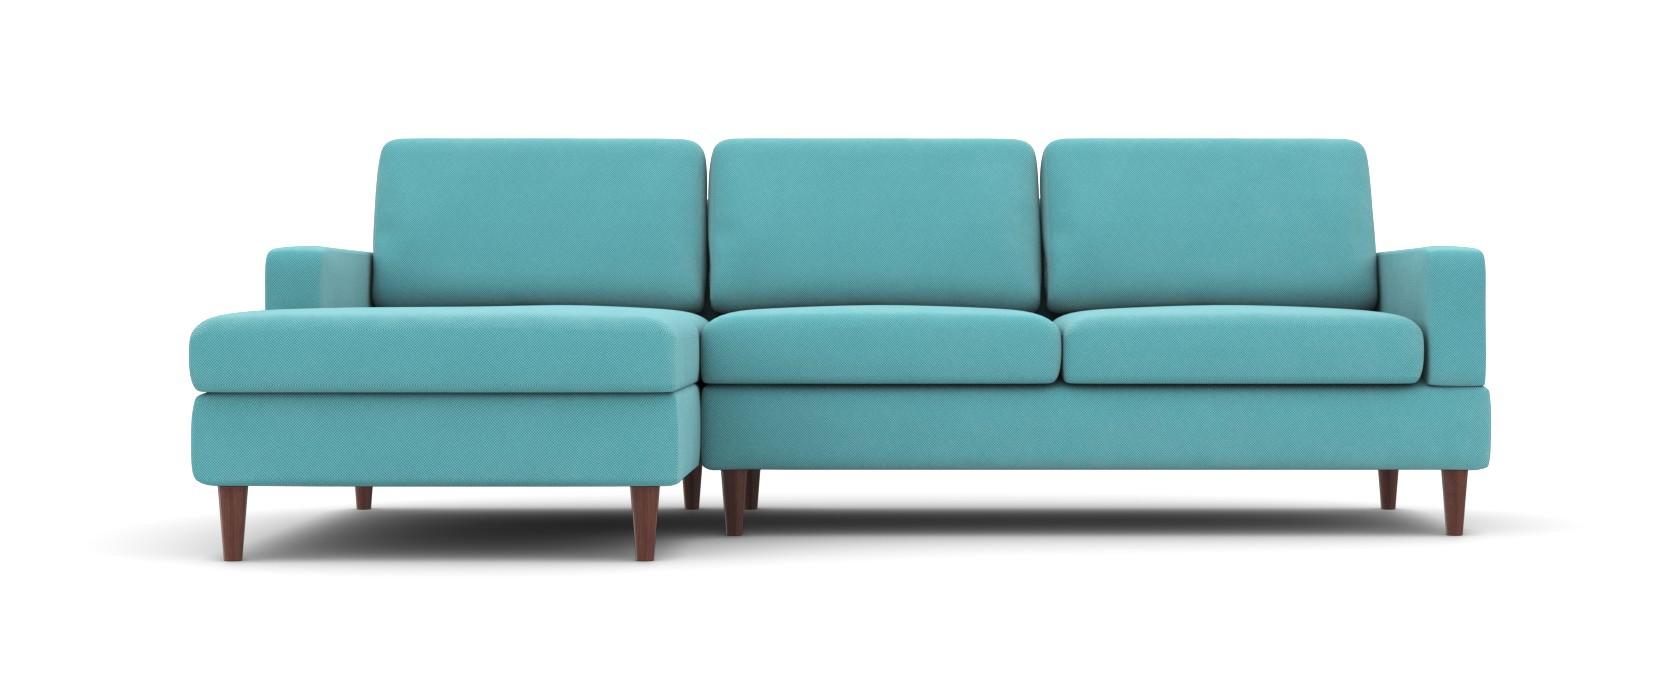 Кутовий диван Bruno - Pufetto